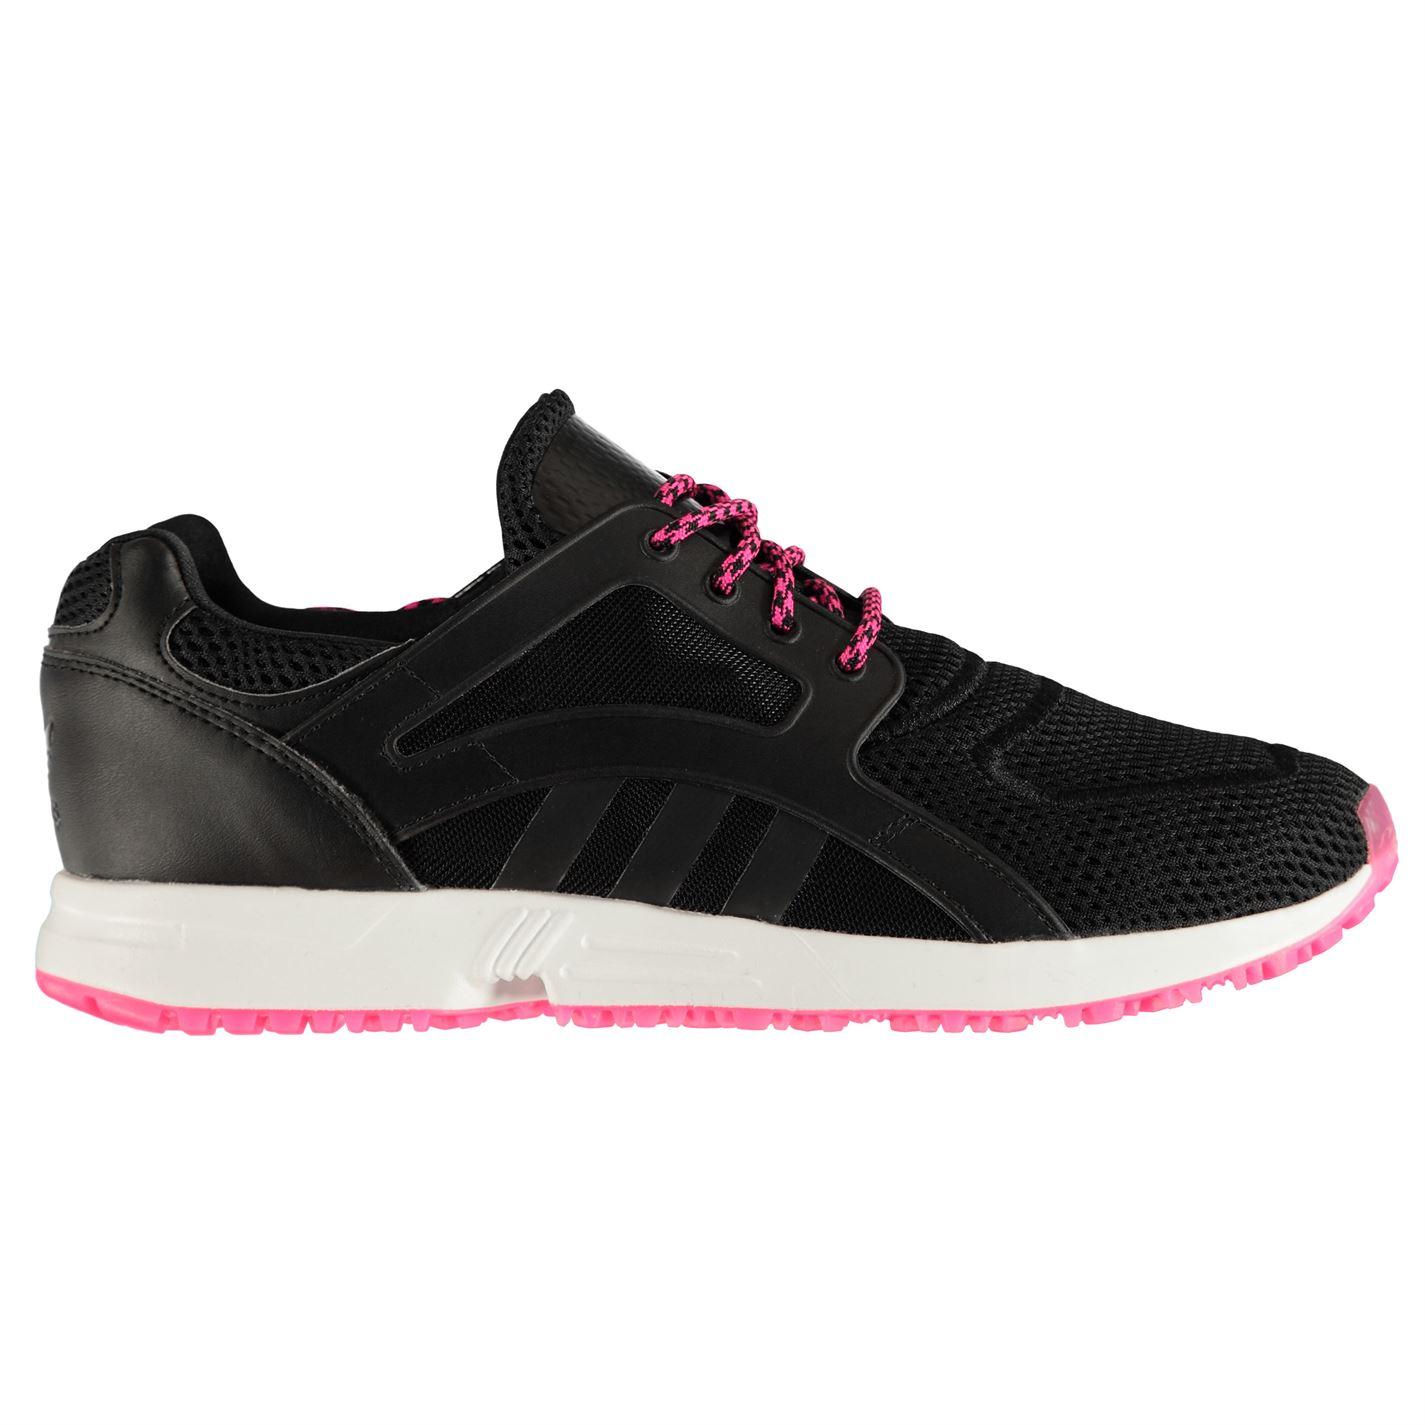 Adidas Racer Lite Trainers Ladies